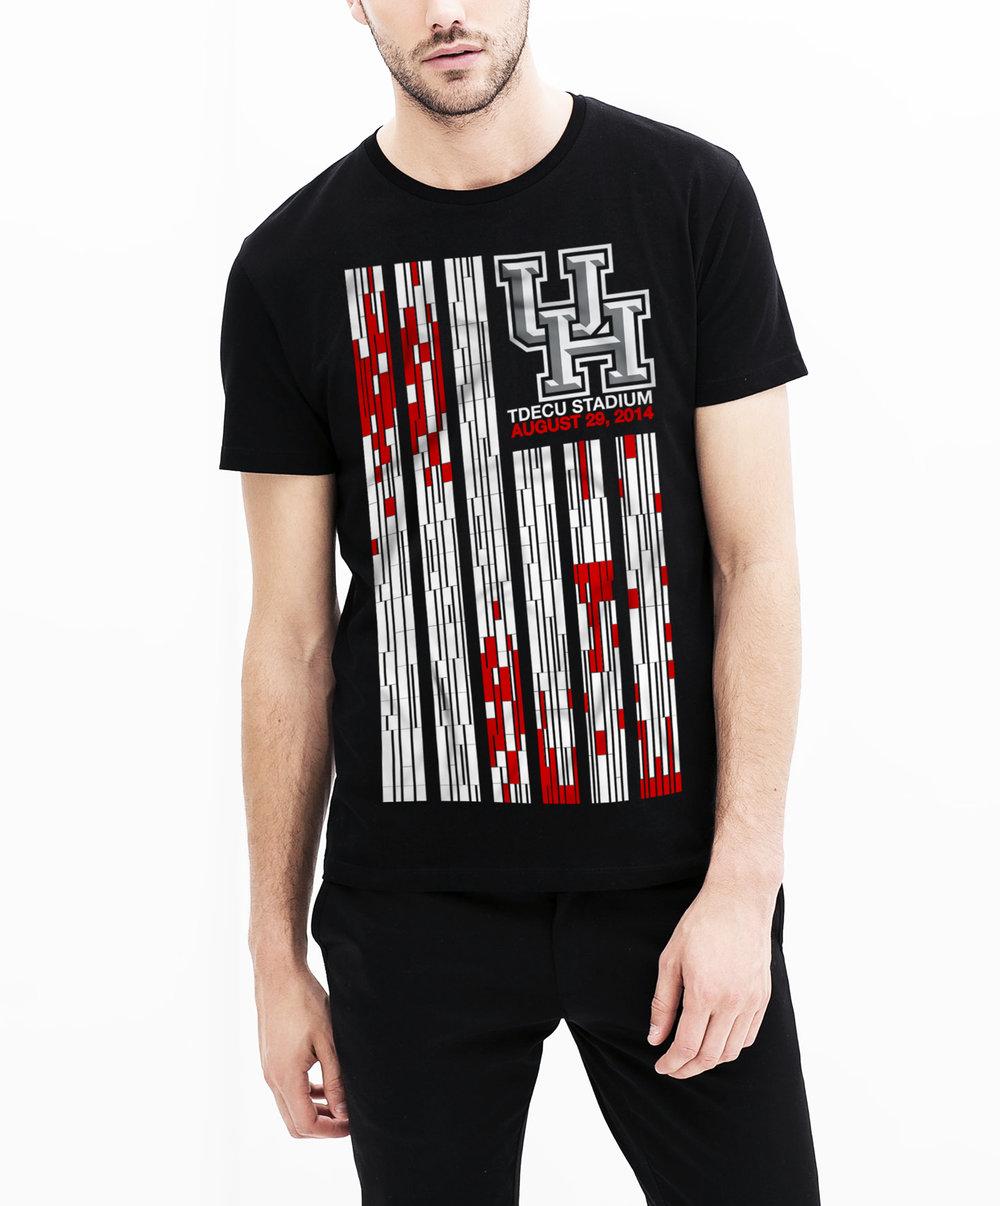 (1/2) UofH Stadium Inaugural T-shirt -  Apparel Graphics